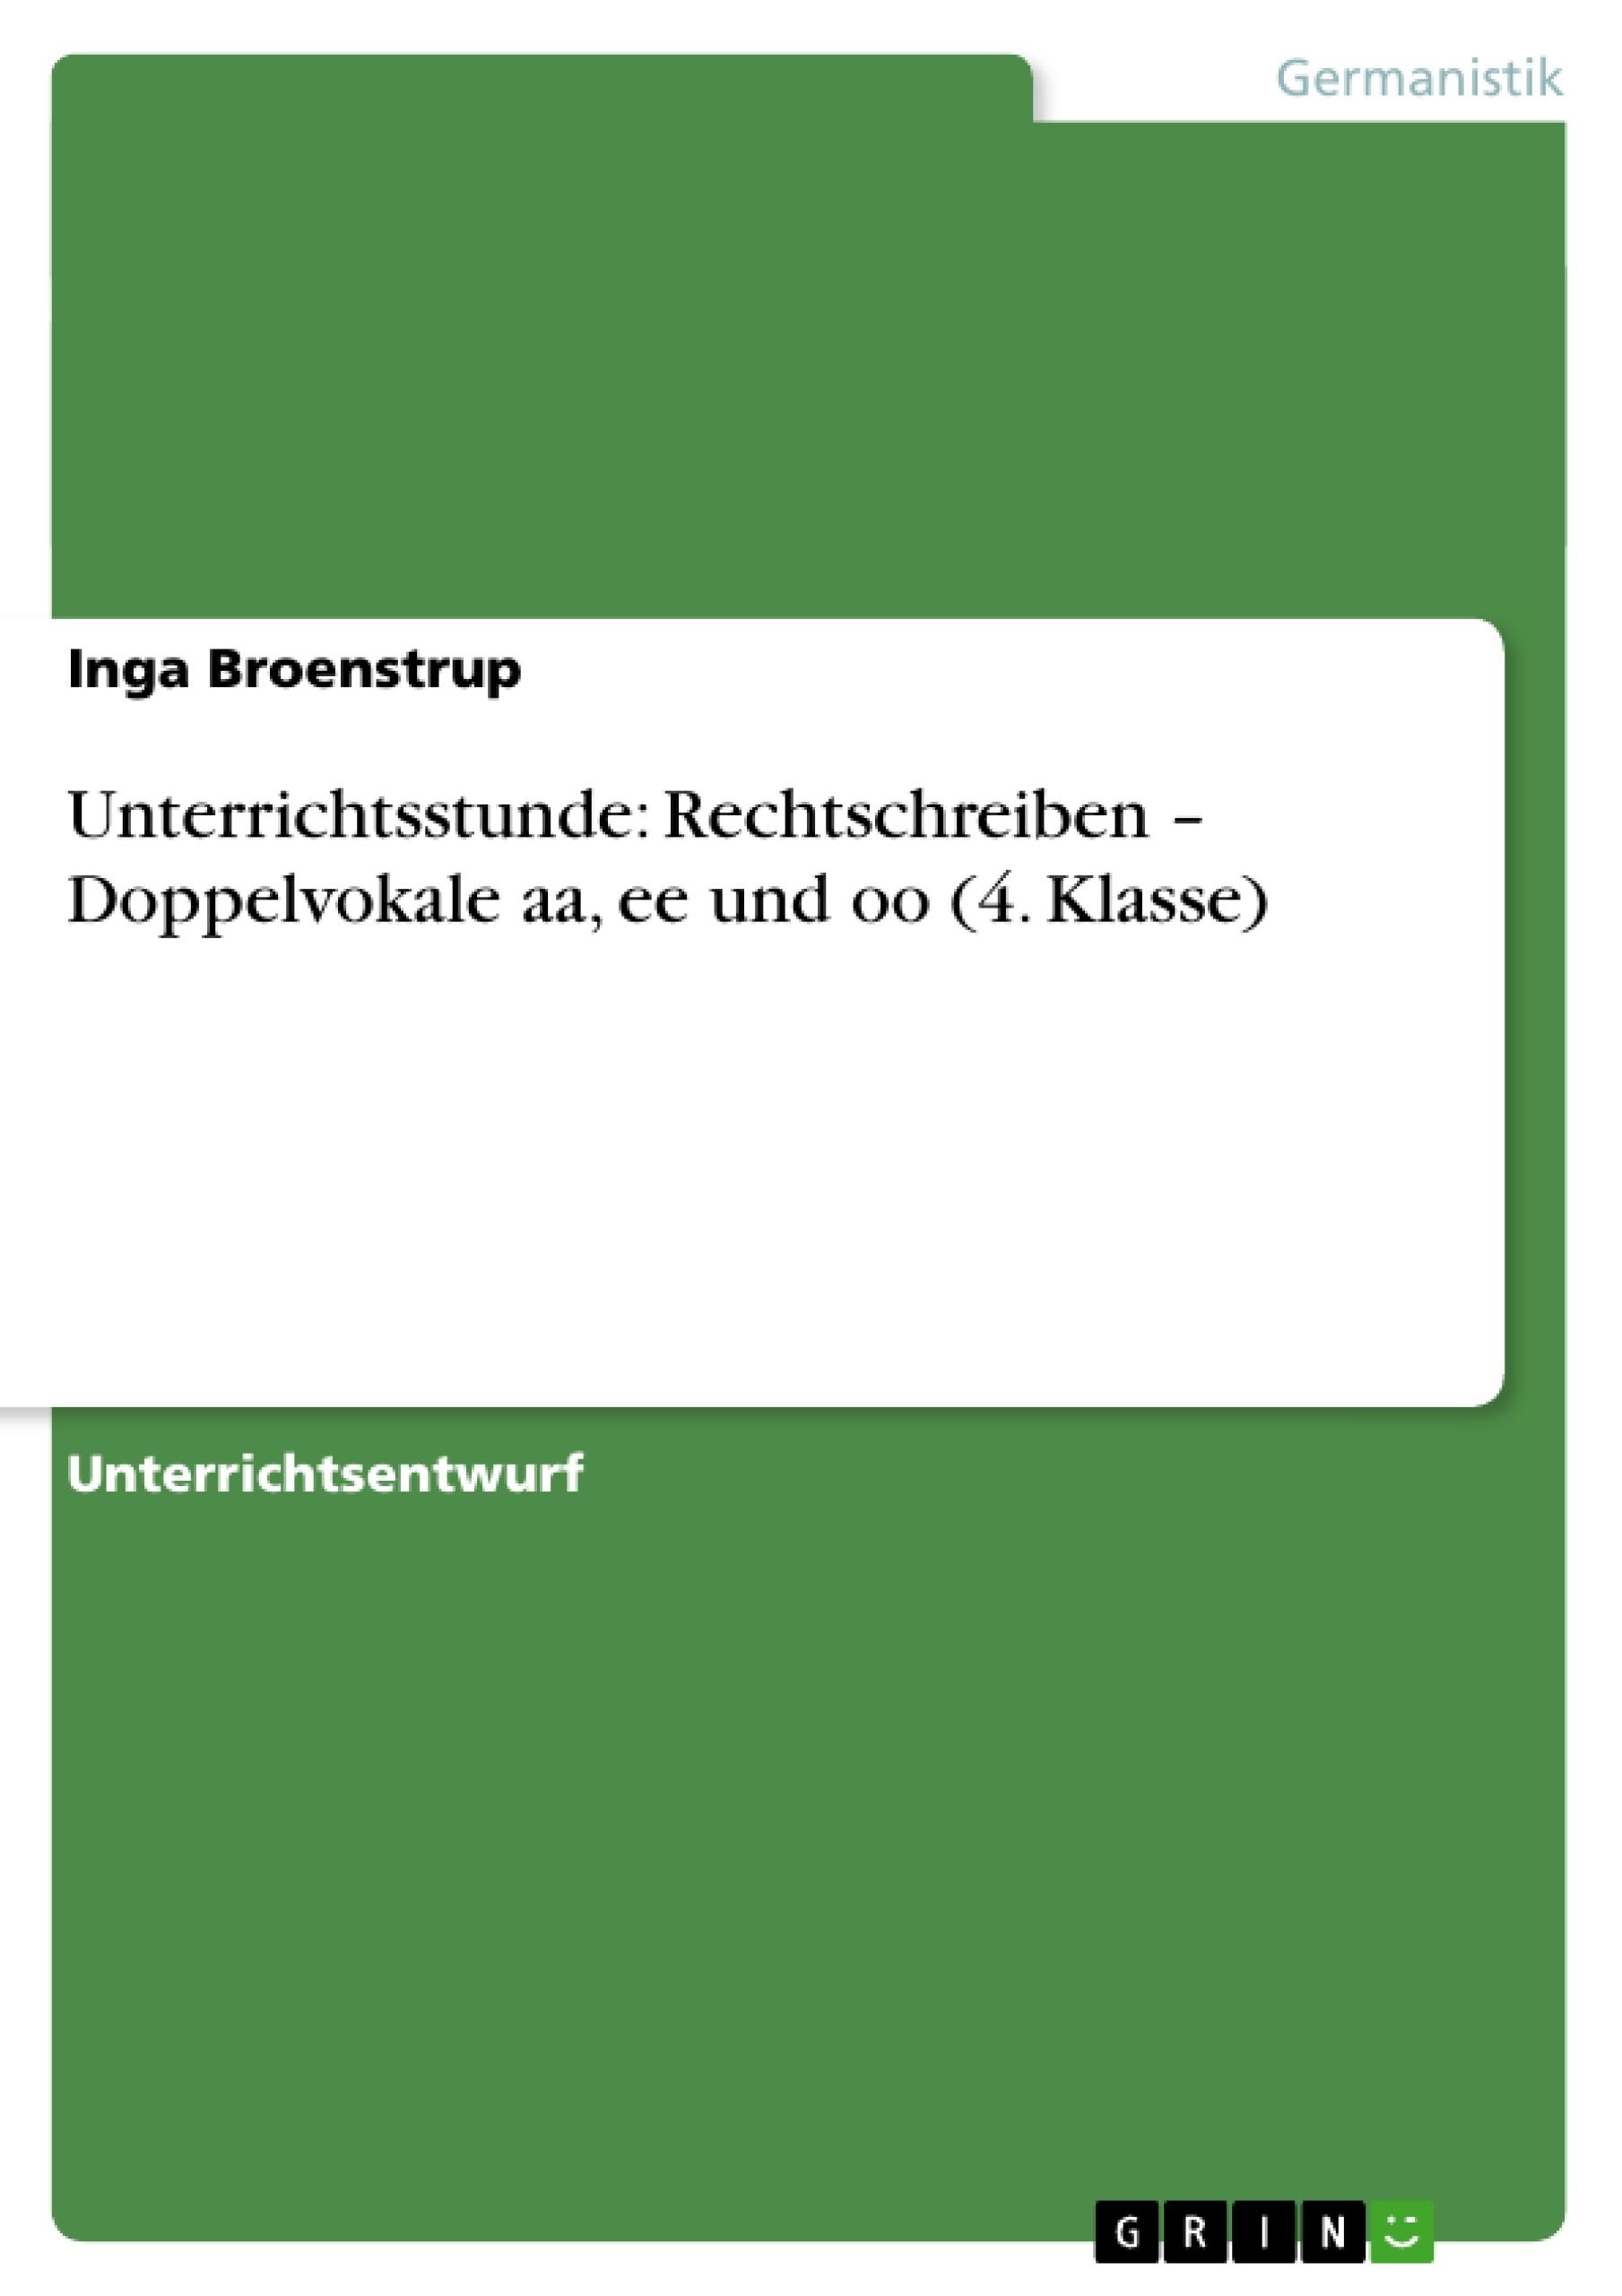 Titel: Unterrichtsstunde: Rechtschreiben – Doppelvokale aa, ee und oo (4. Klasse)